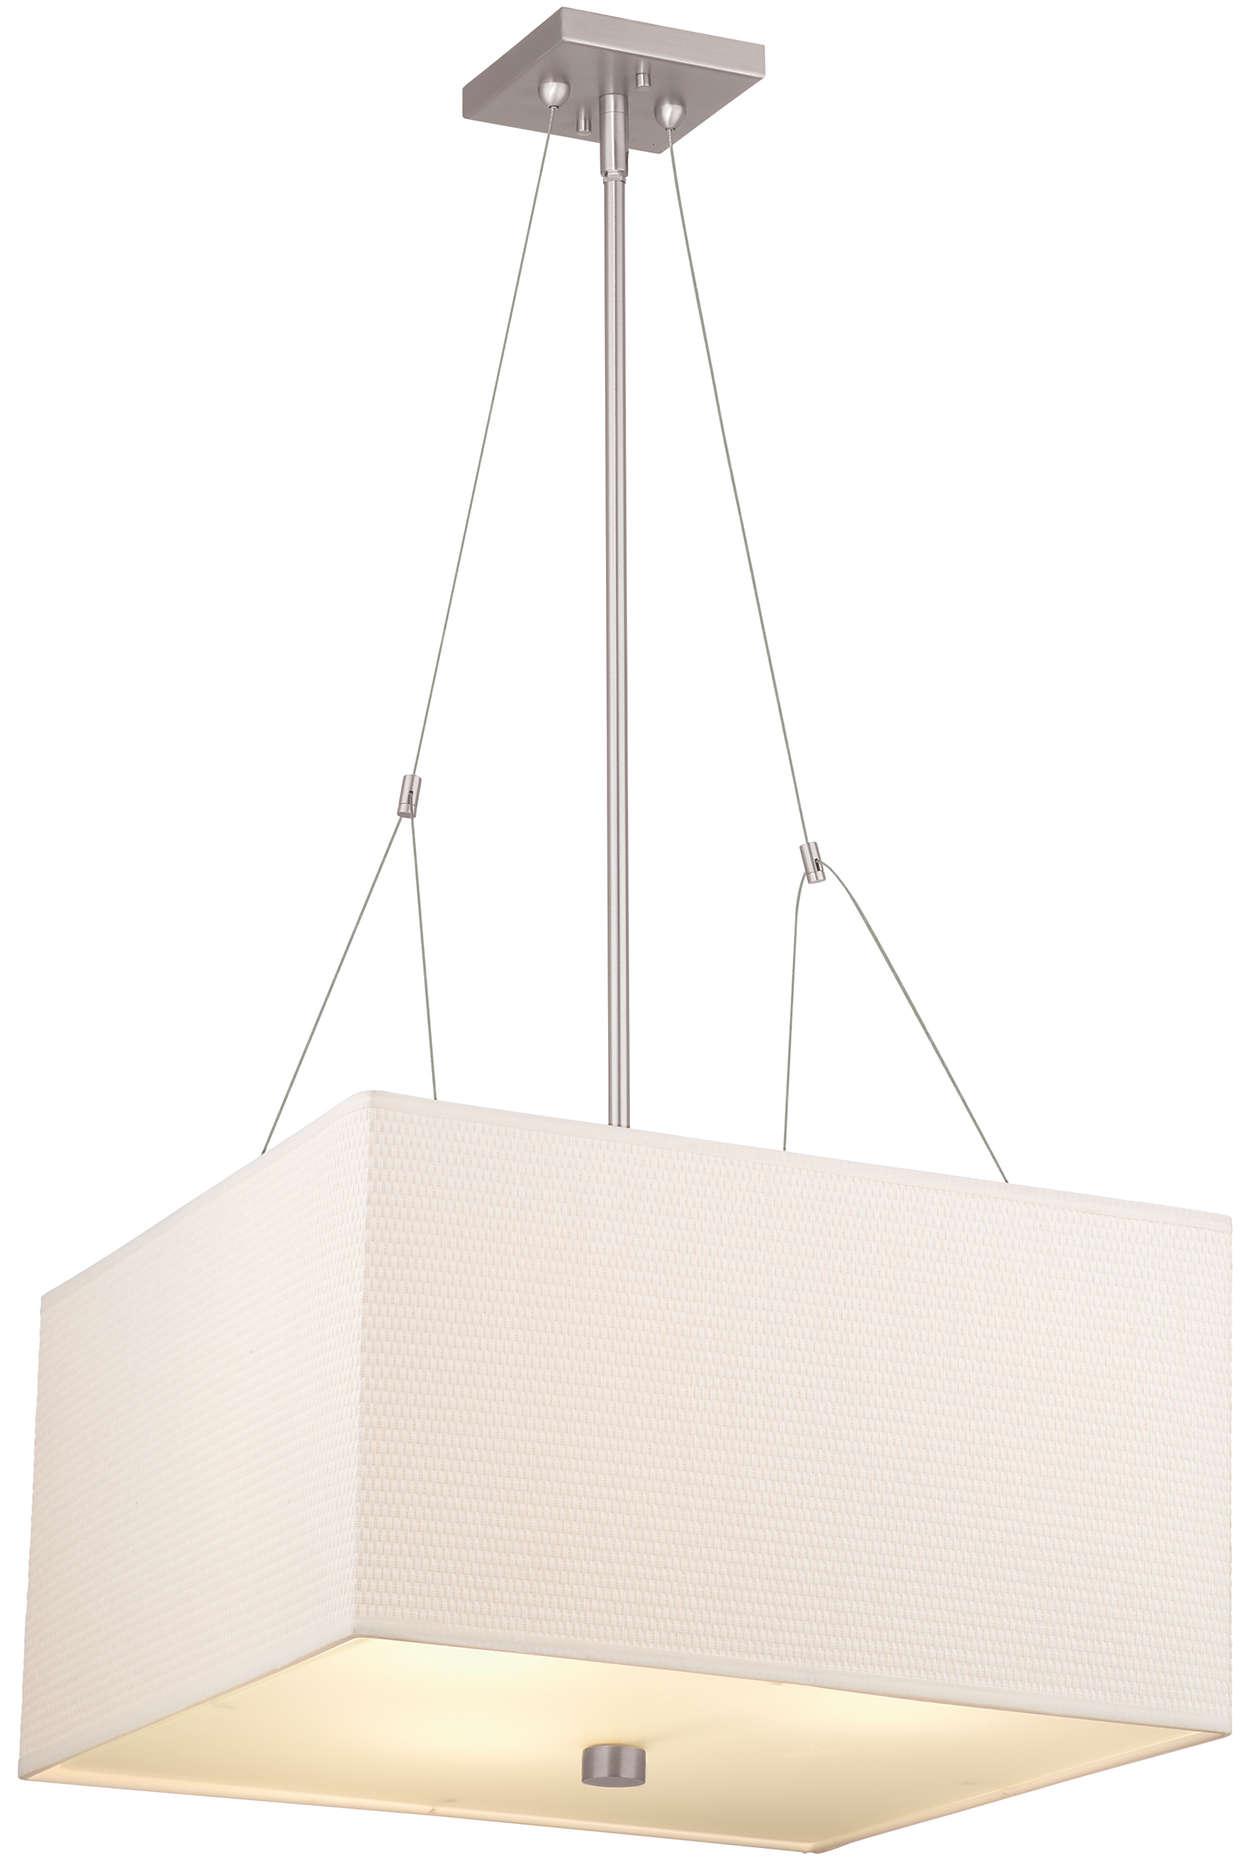 Suspension Light F44136 Forecast